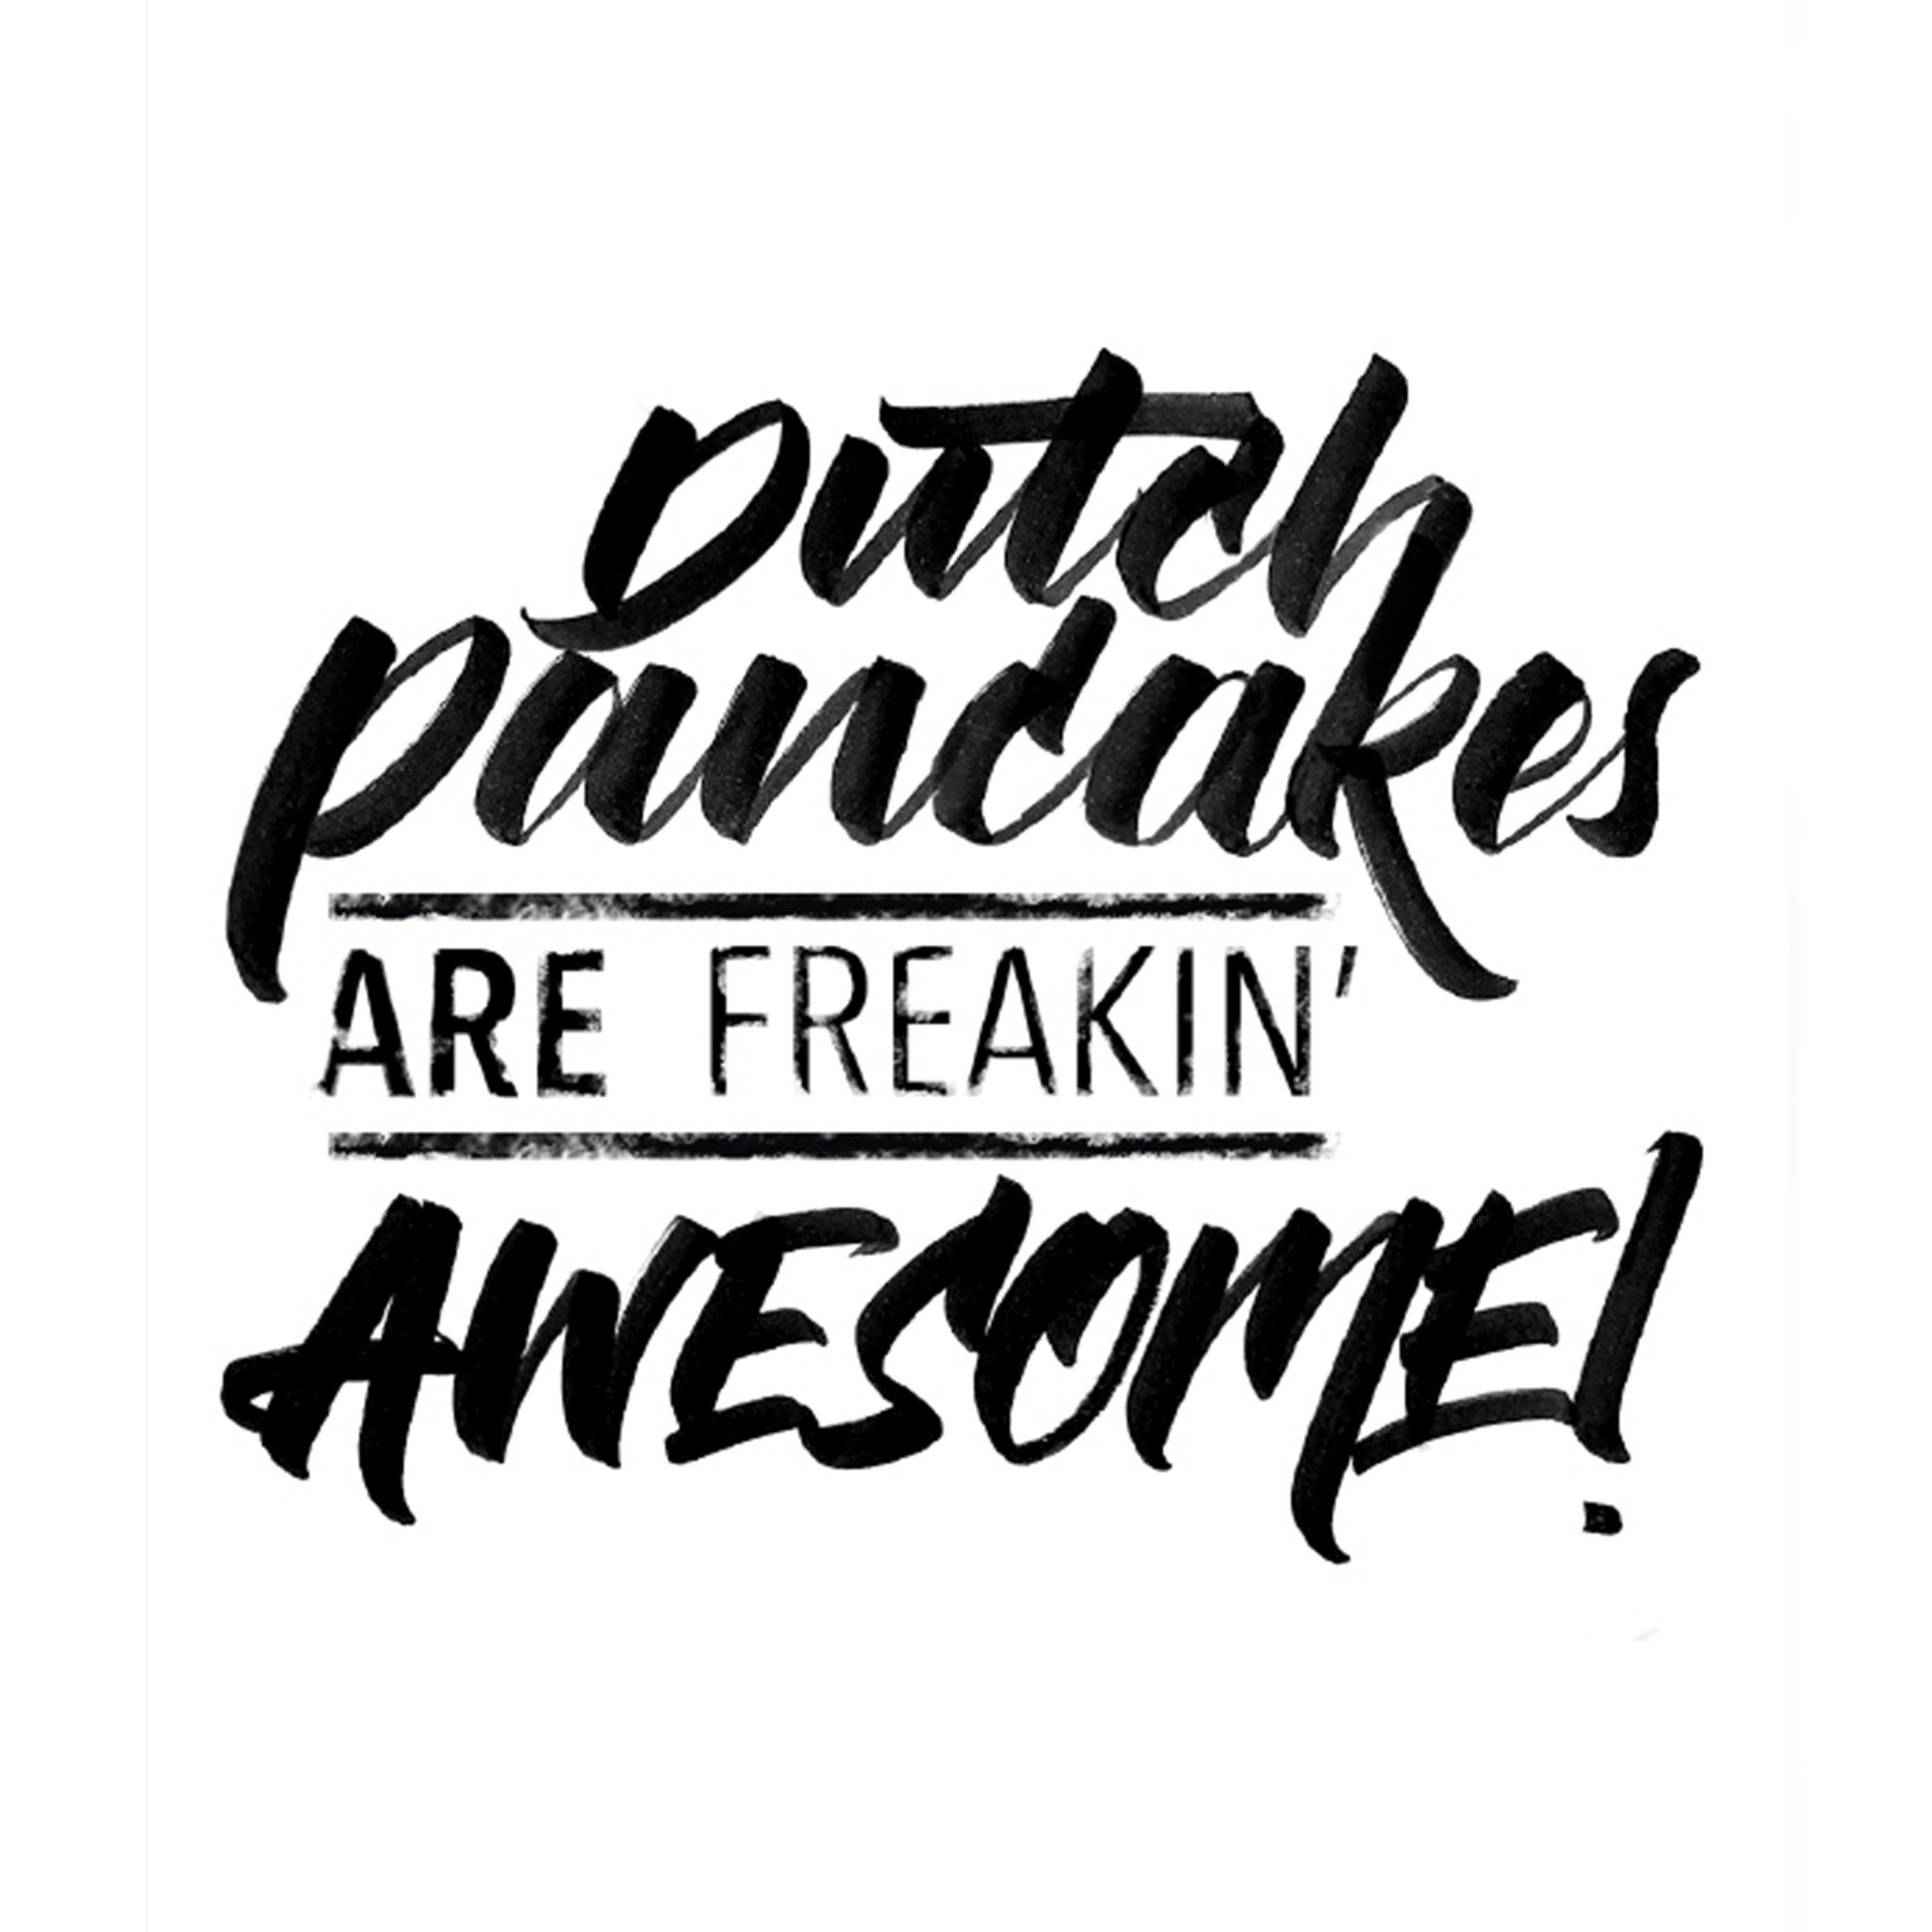 LETTERING-Typography-Amsterdam-Pancakes.jpg